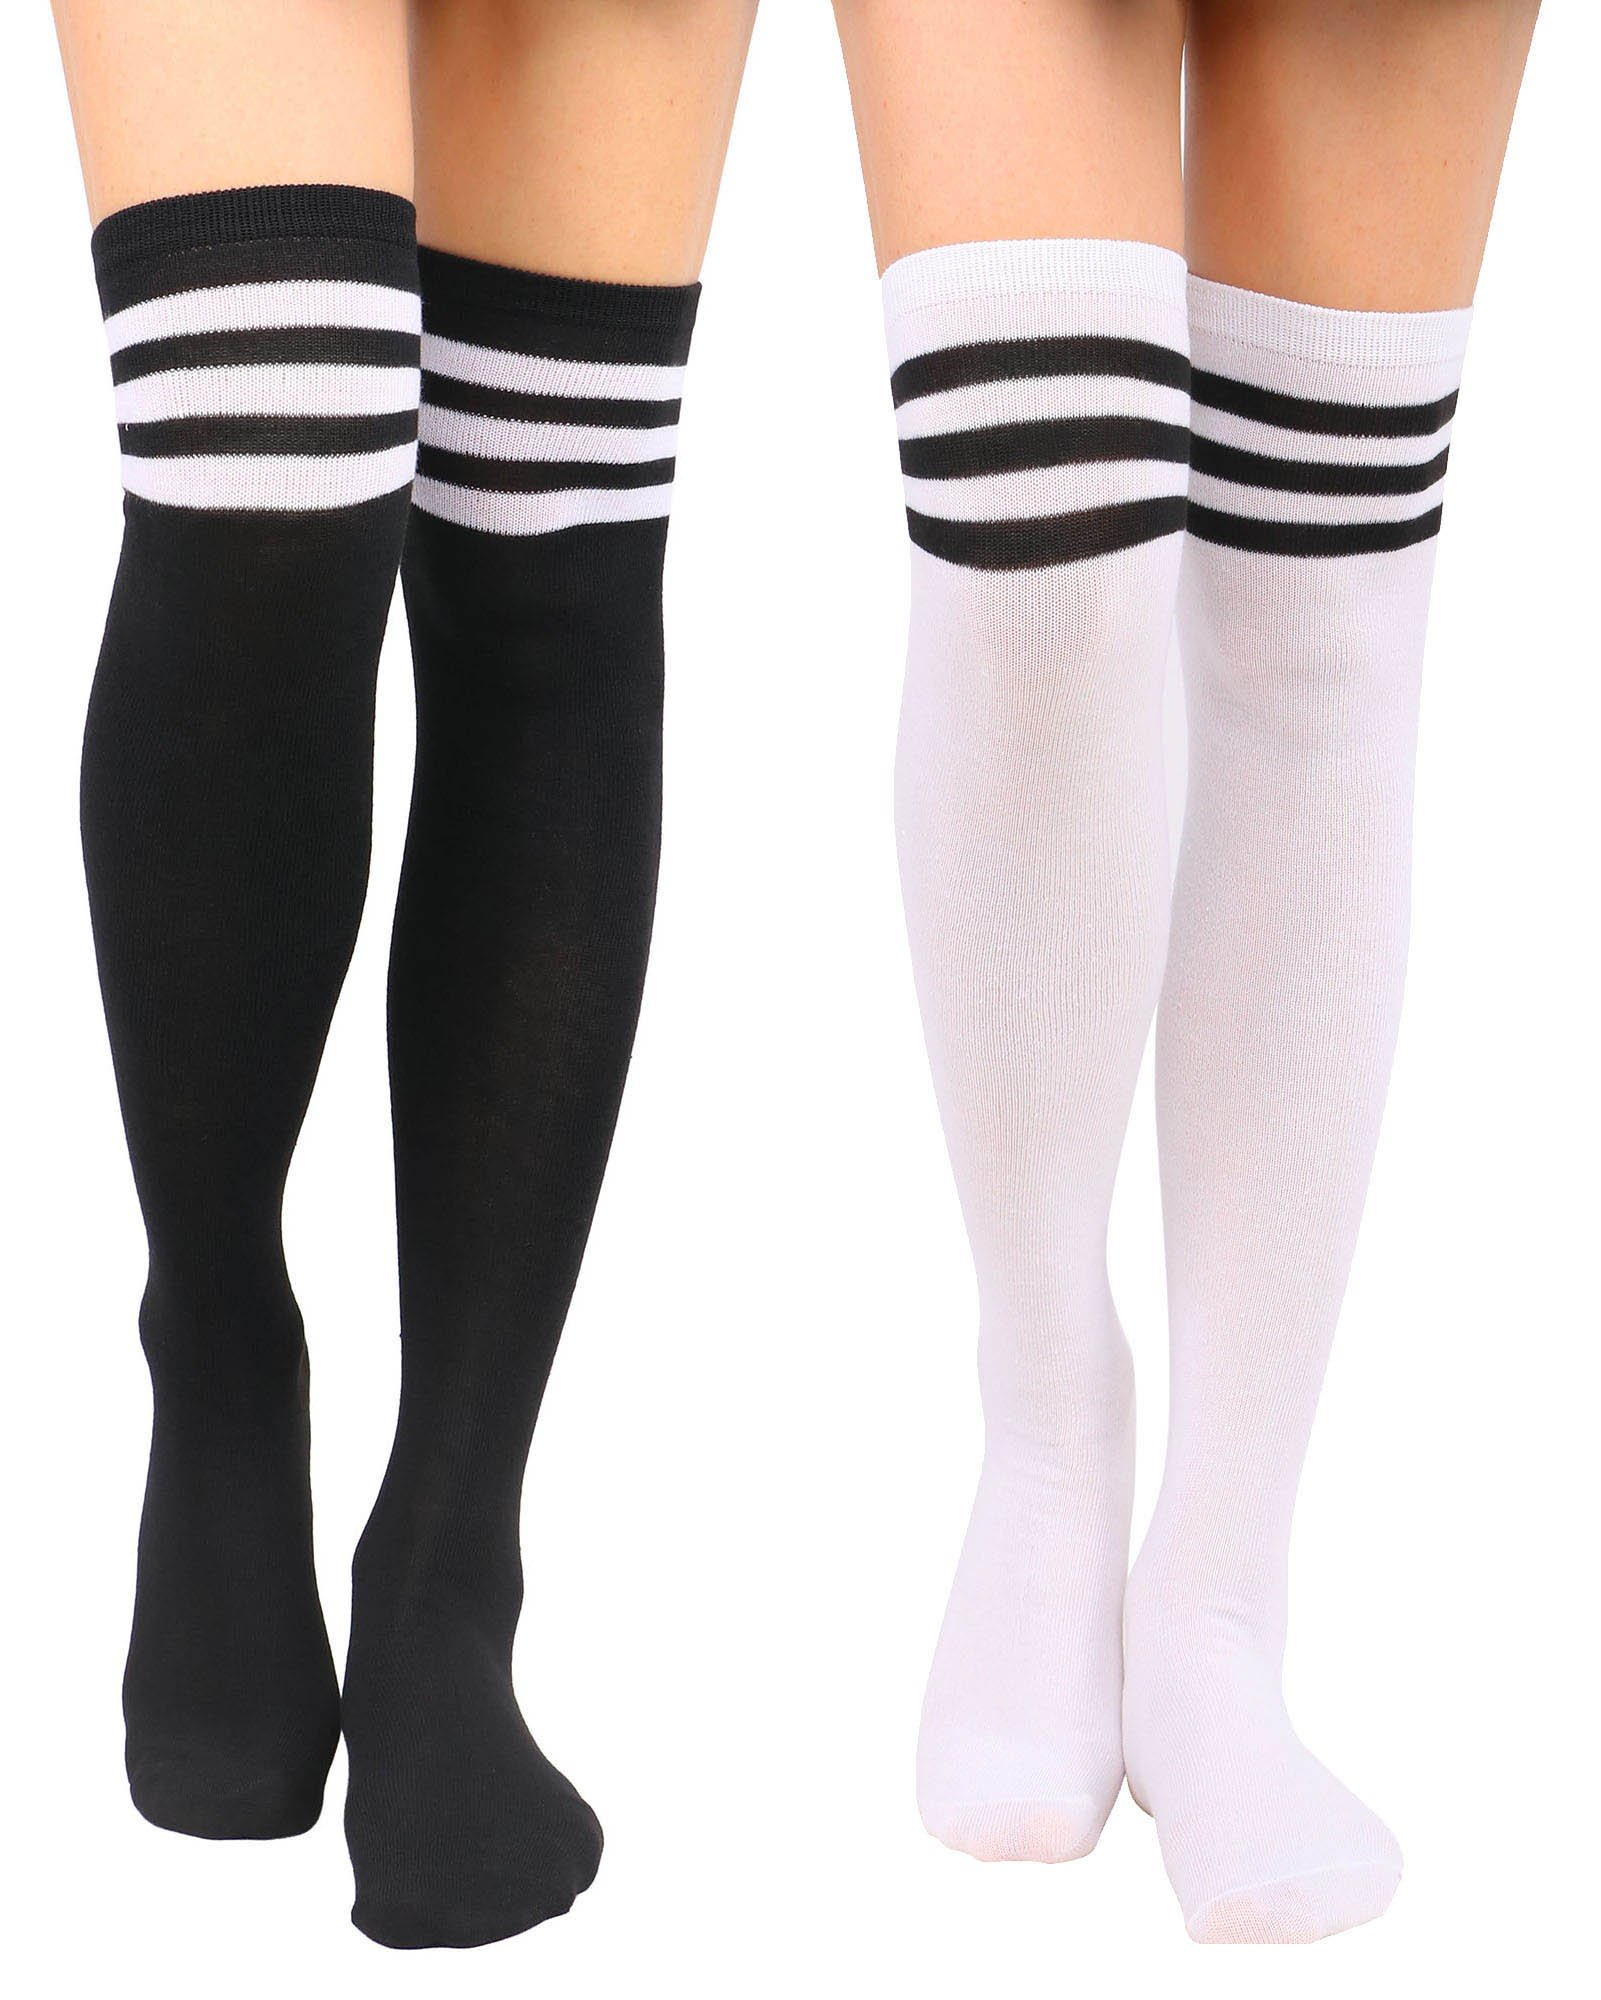 Jasmine Tube Socks Women's Retro Striped Long Knee High Socks Thigh High Stockings